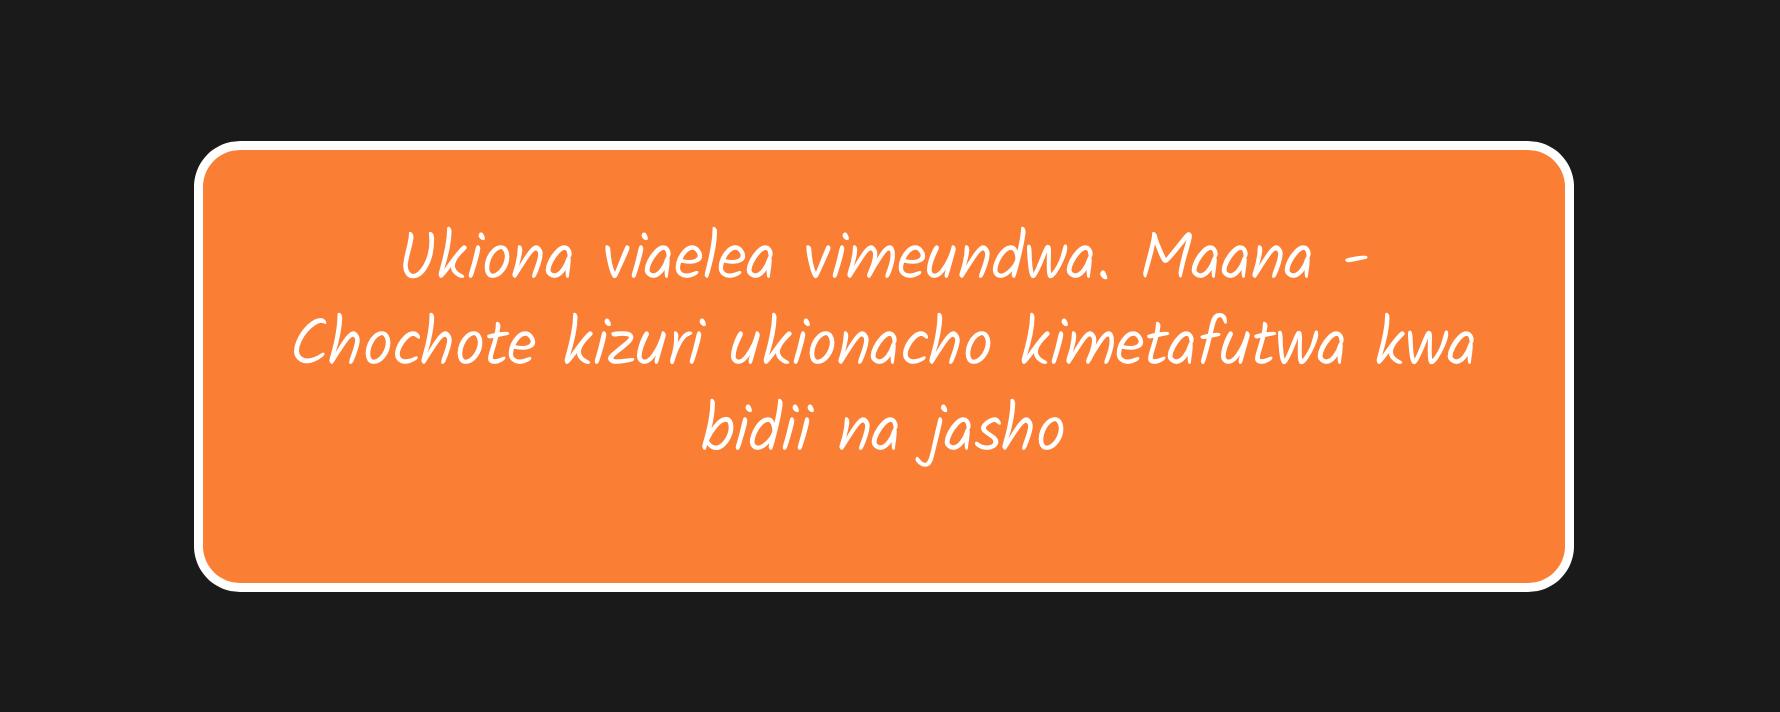 eLimu Kiswahili Revision